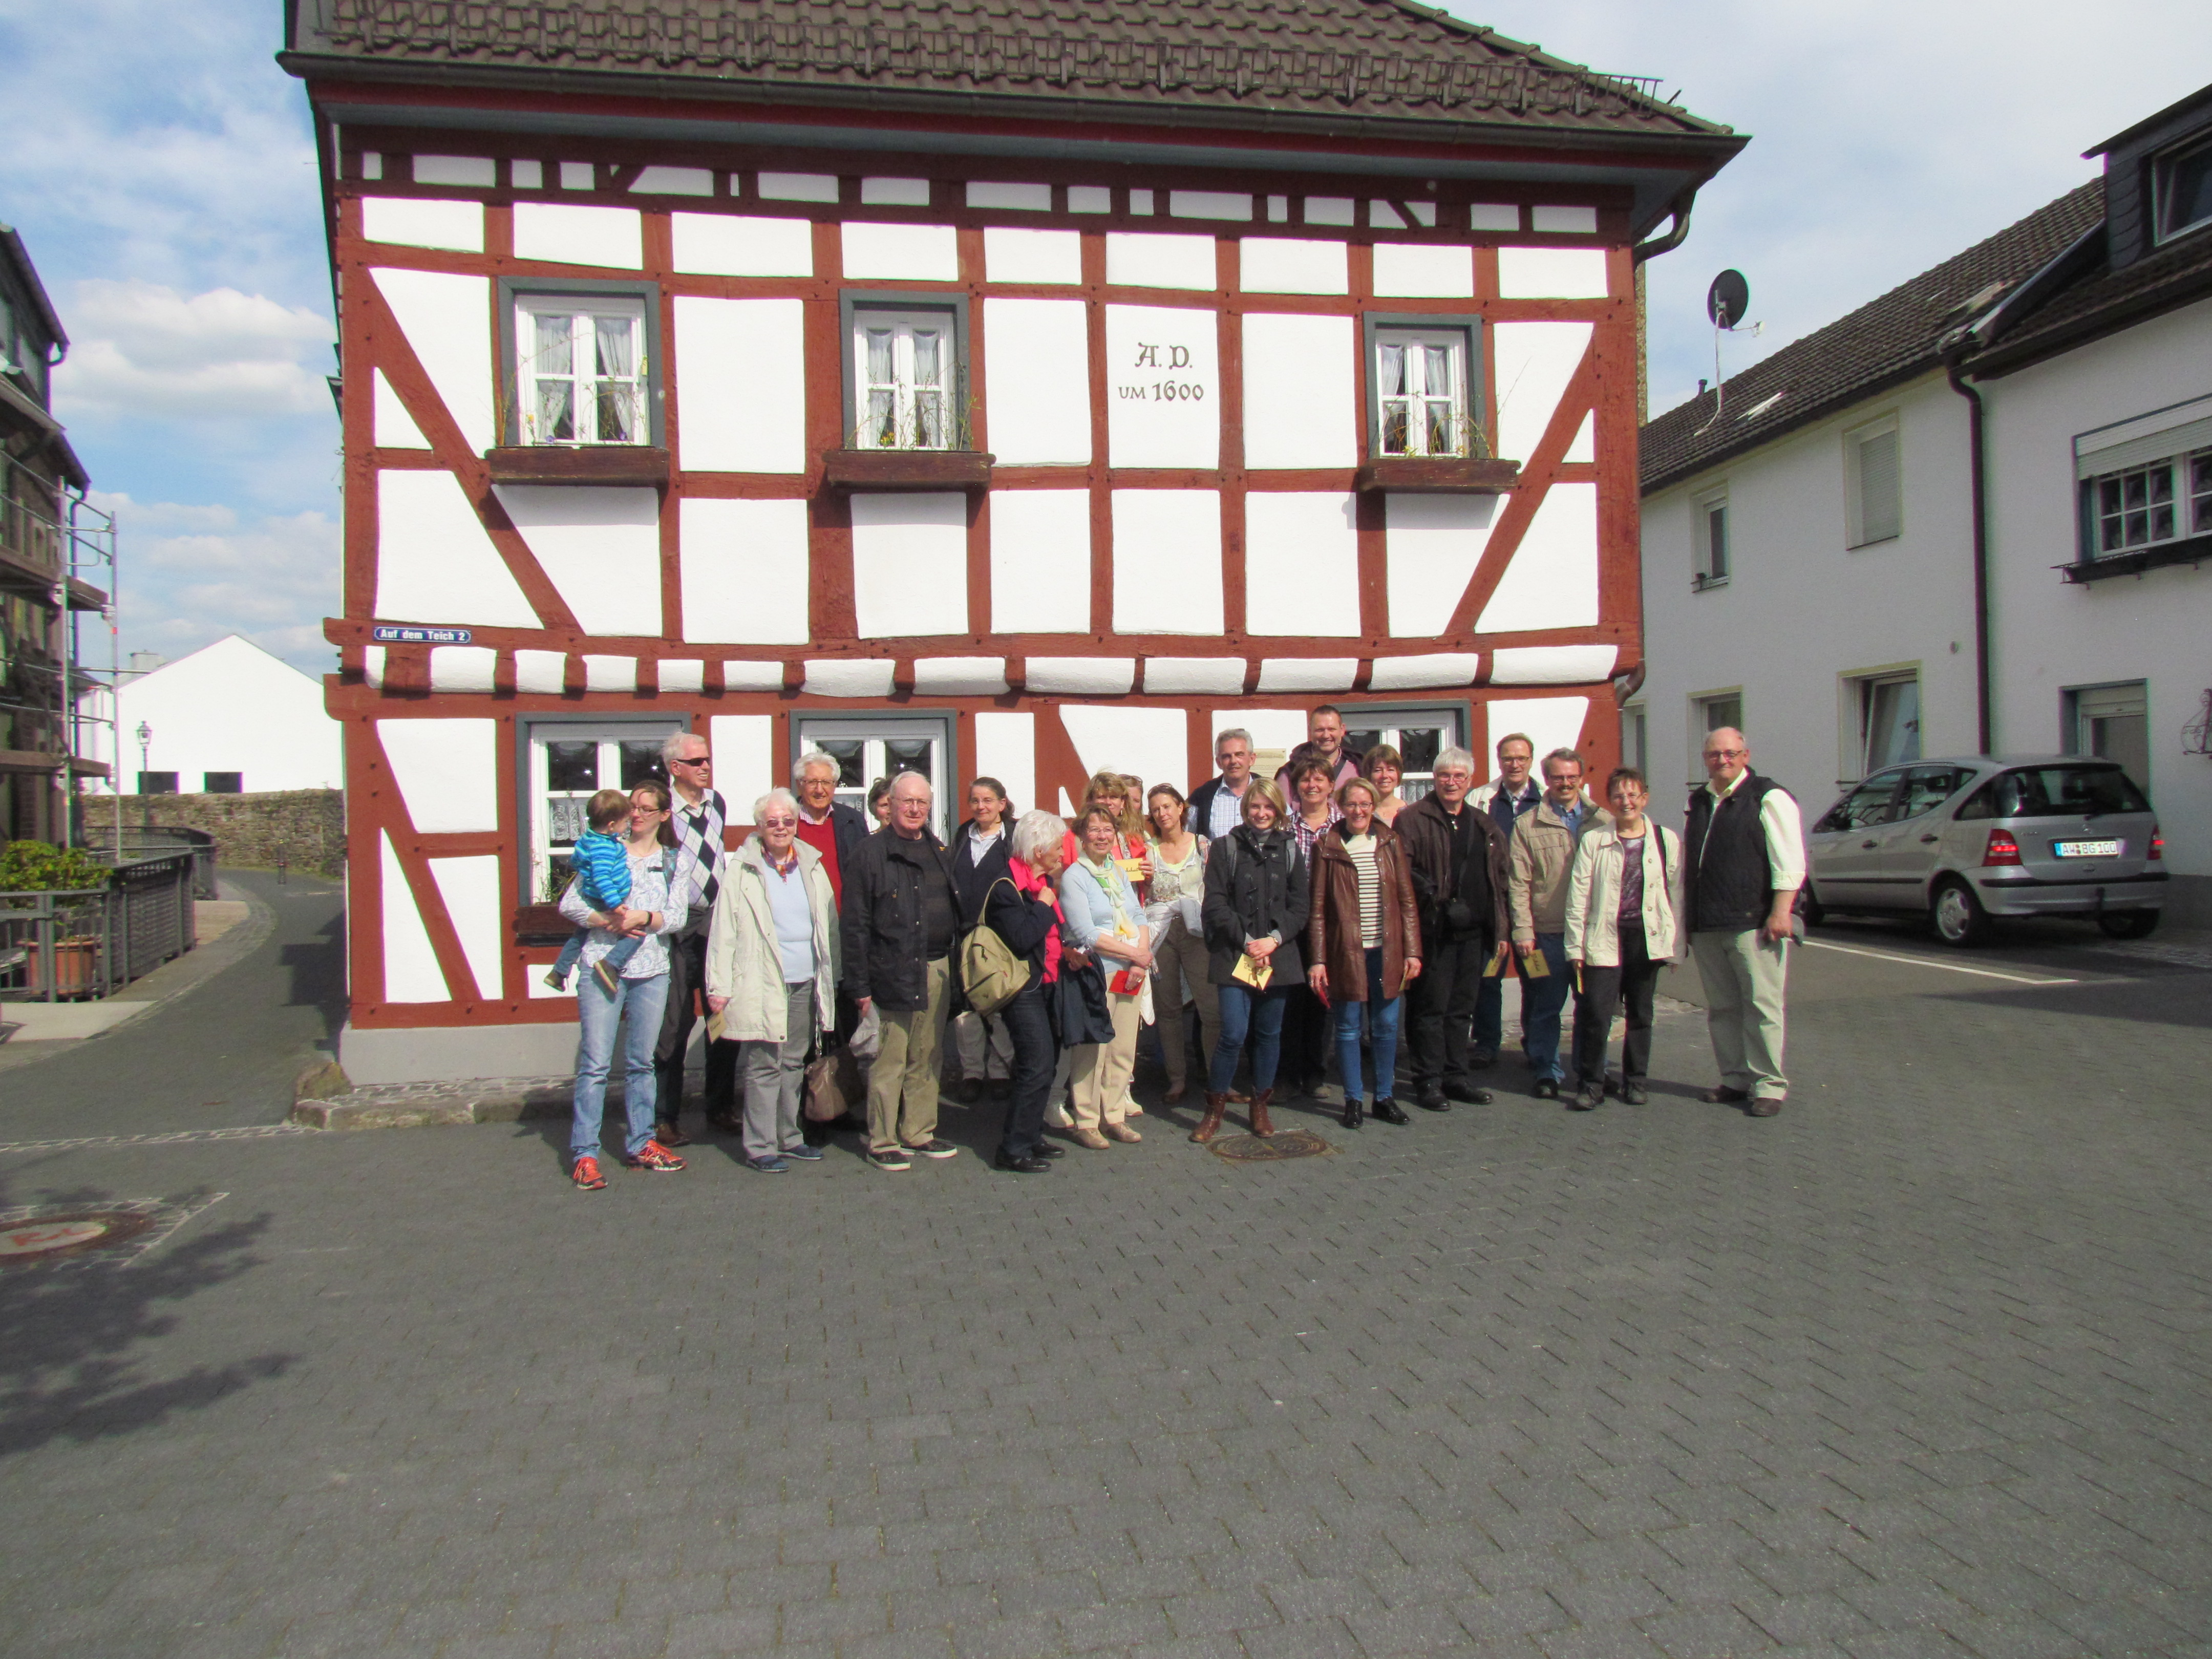 2017-05-Mai-06-Chorausflug-Ahrweiler_Bernd-Finken_048